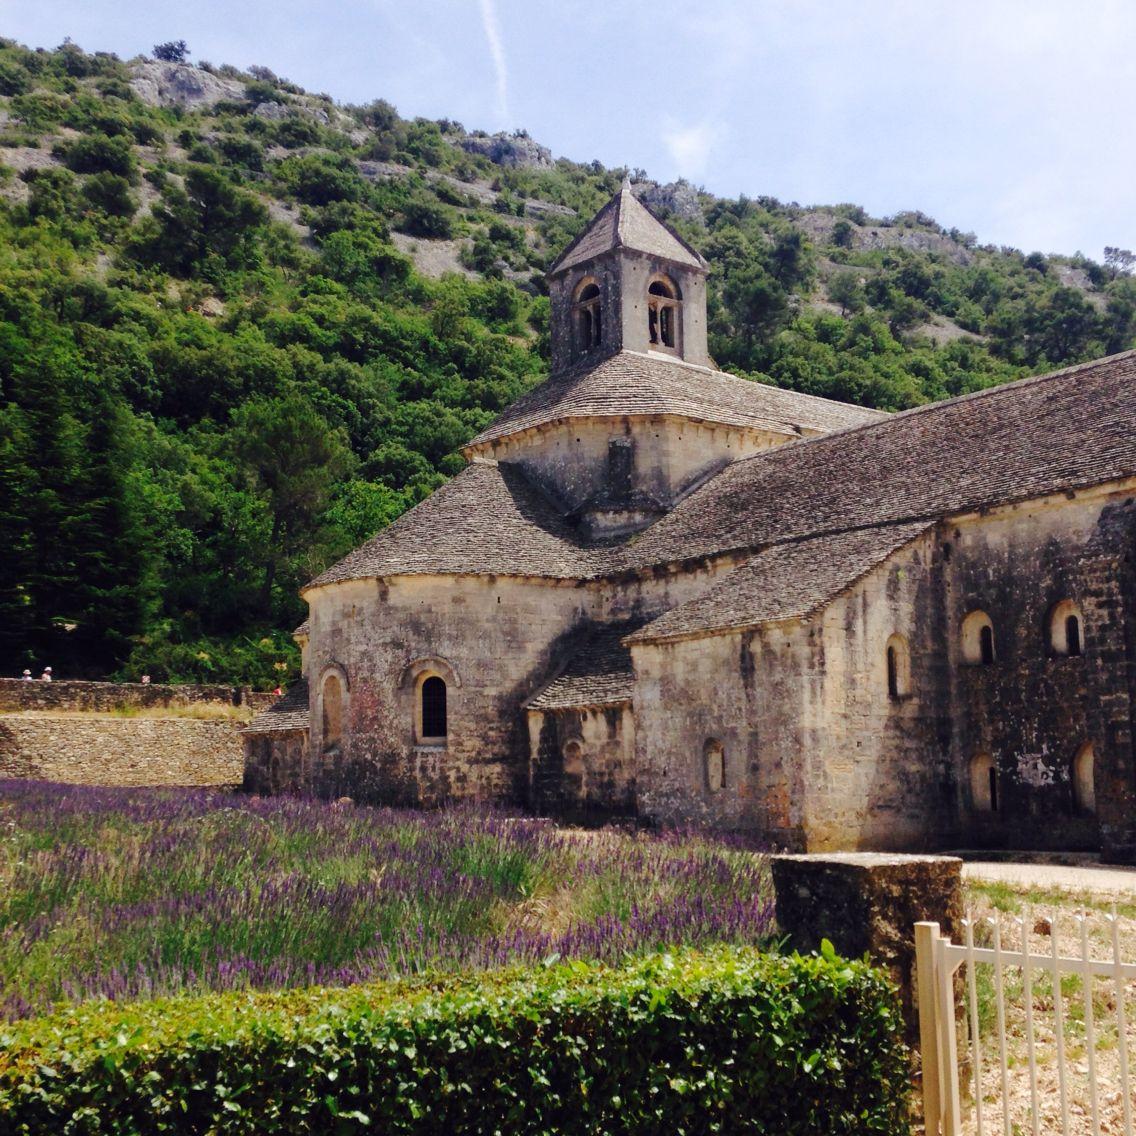 My own Abbaye de Sénanque picture! A Pinterest dream came true! marits88